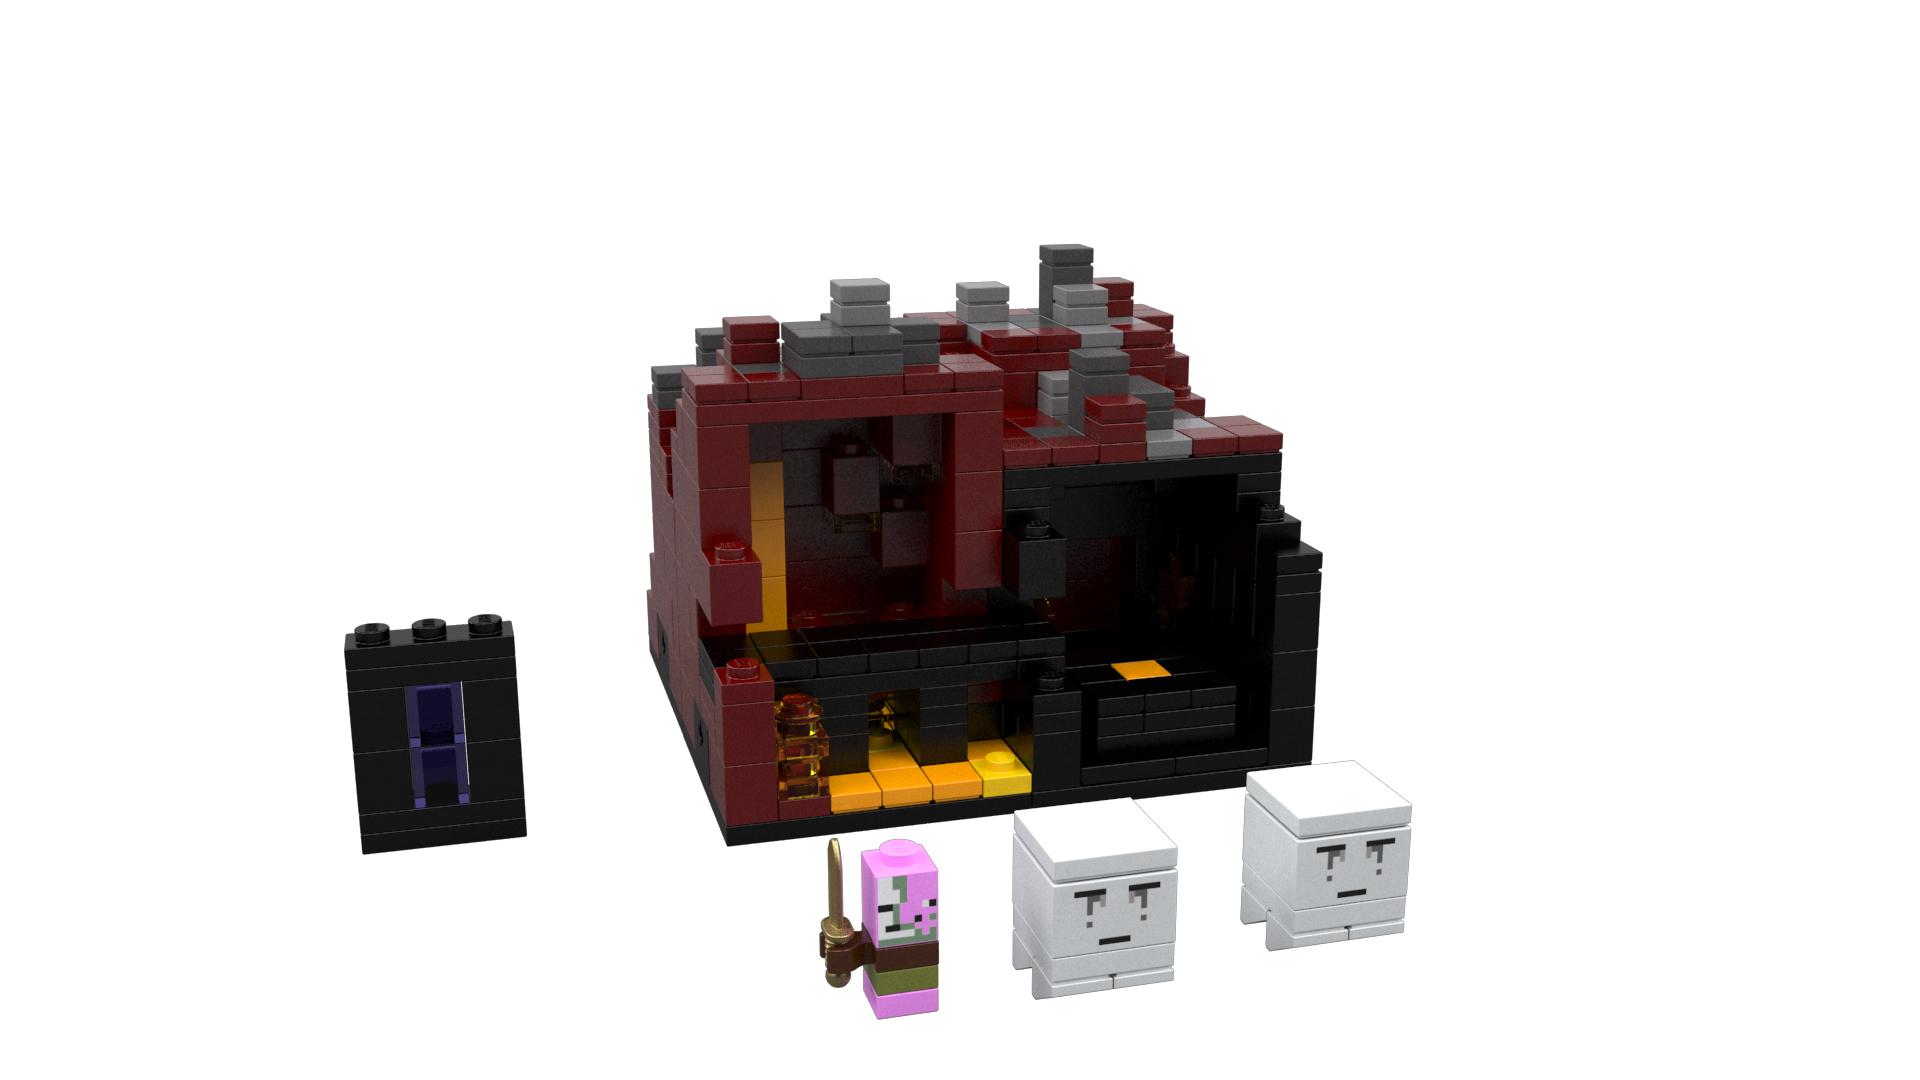 Sdcc lego announces minecraft collection